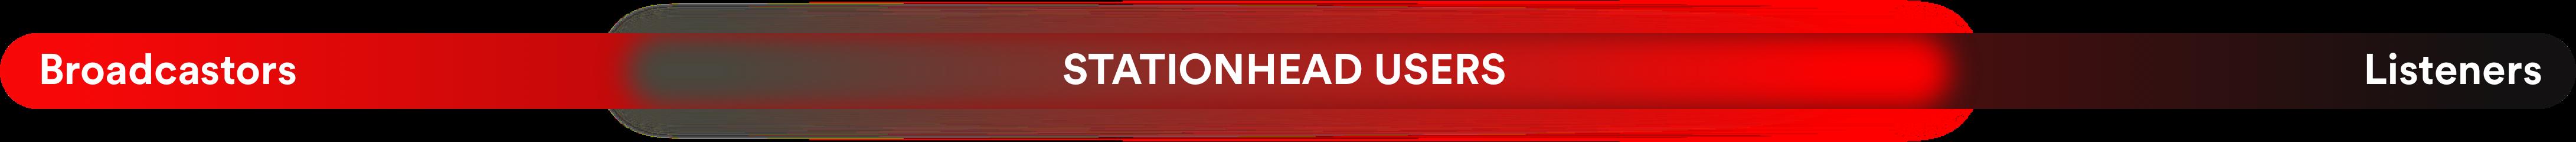 stationhead_bar.png